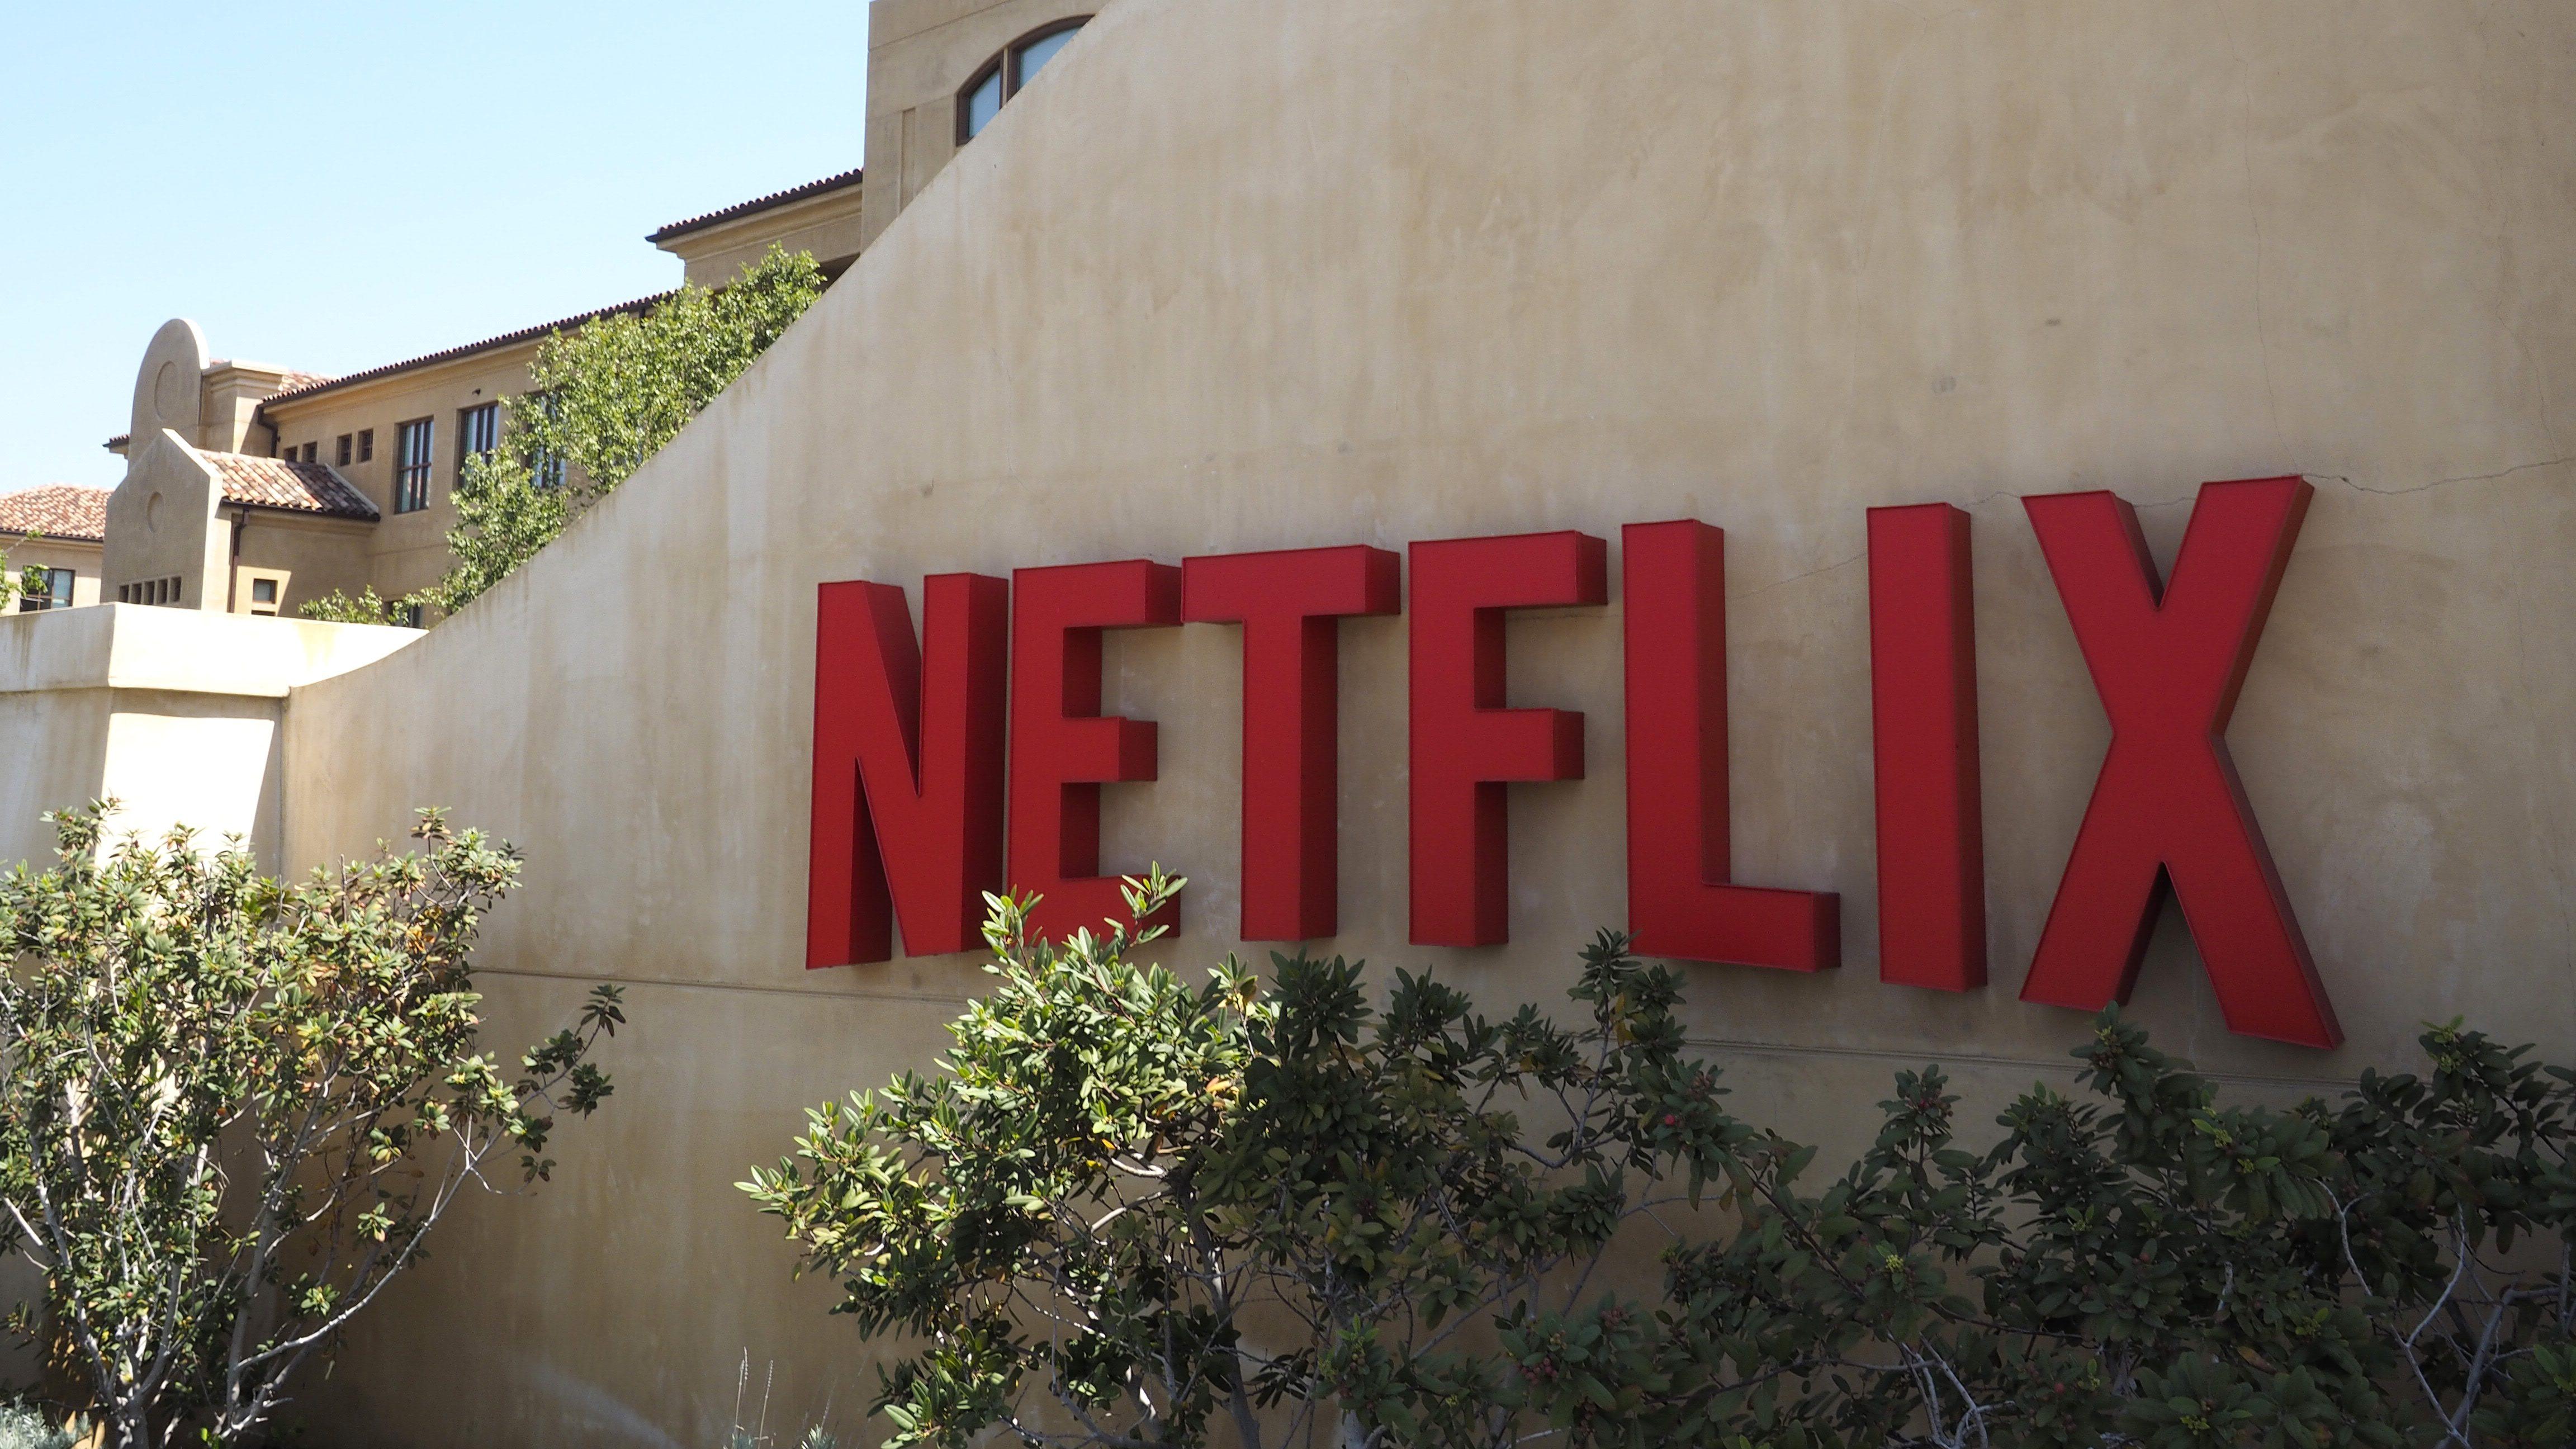 Netflix Shares Dip On Subscriber Slowdown, But Wall Street Bulls Still Buy The Story